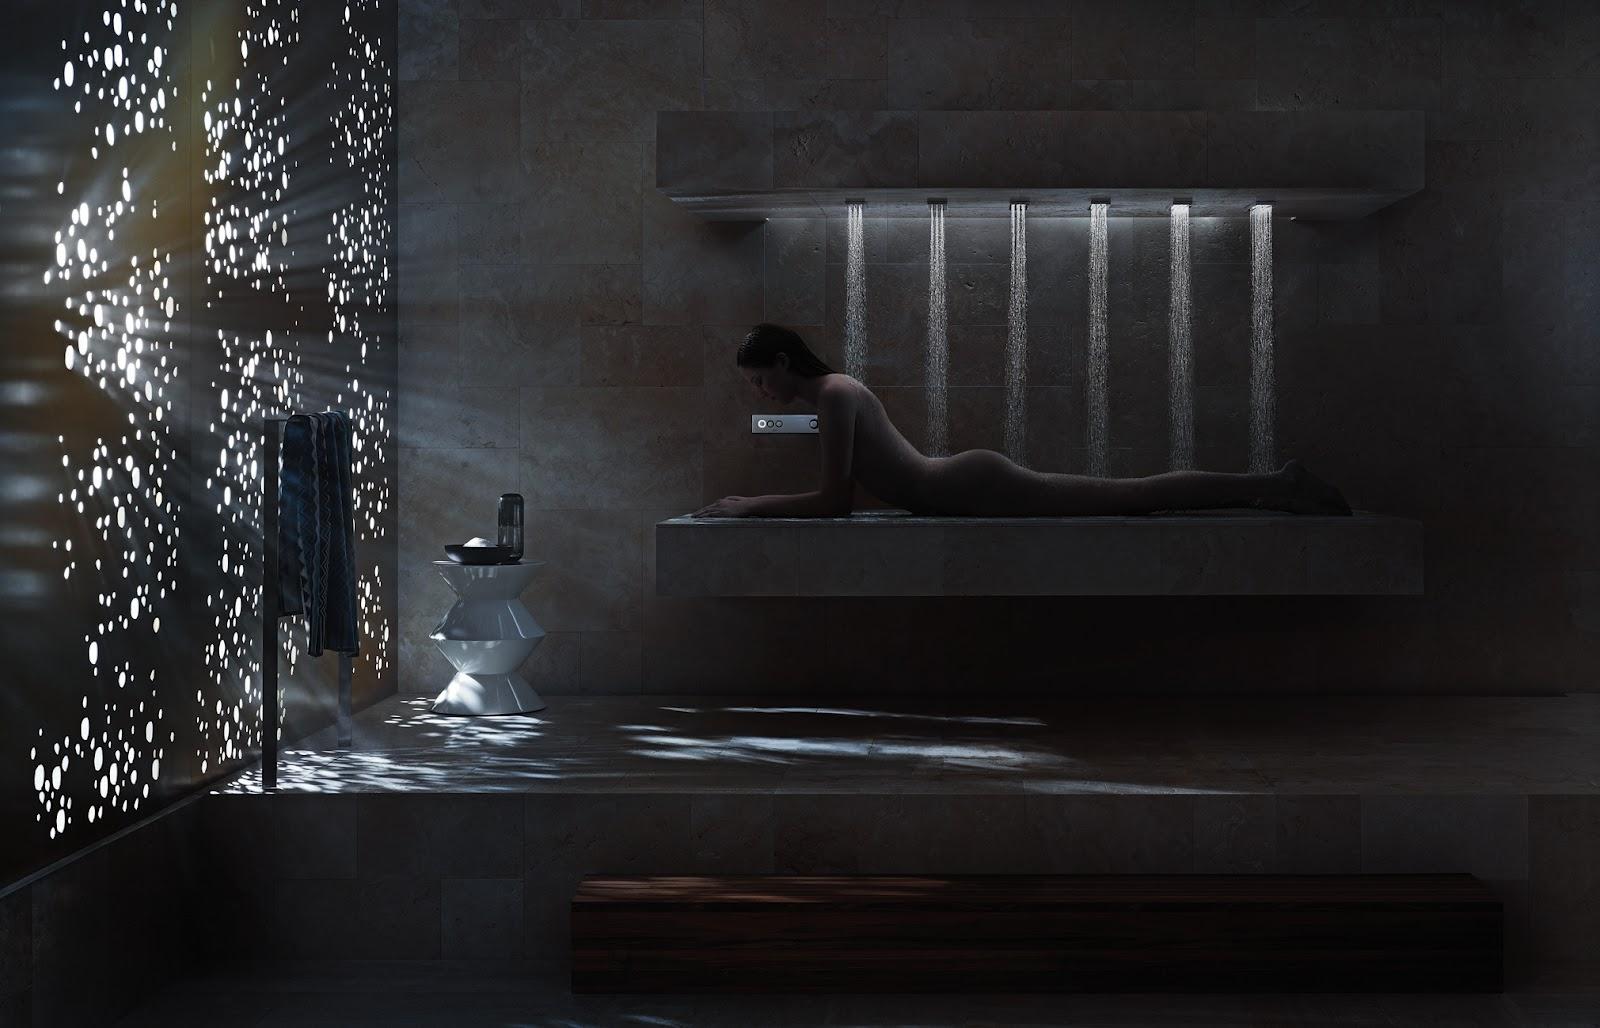 funky friday blog ambiance tuning technique van dornbracht horizontale douche verbreedt de. Black Bedroom Furniture Sets. Home Design Ideas